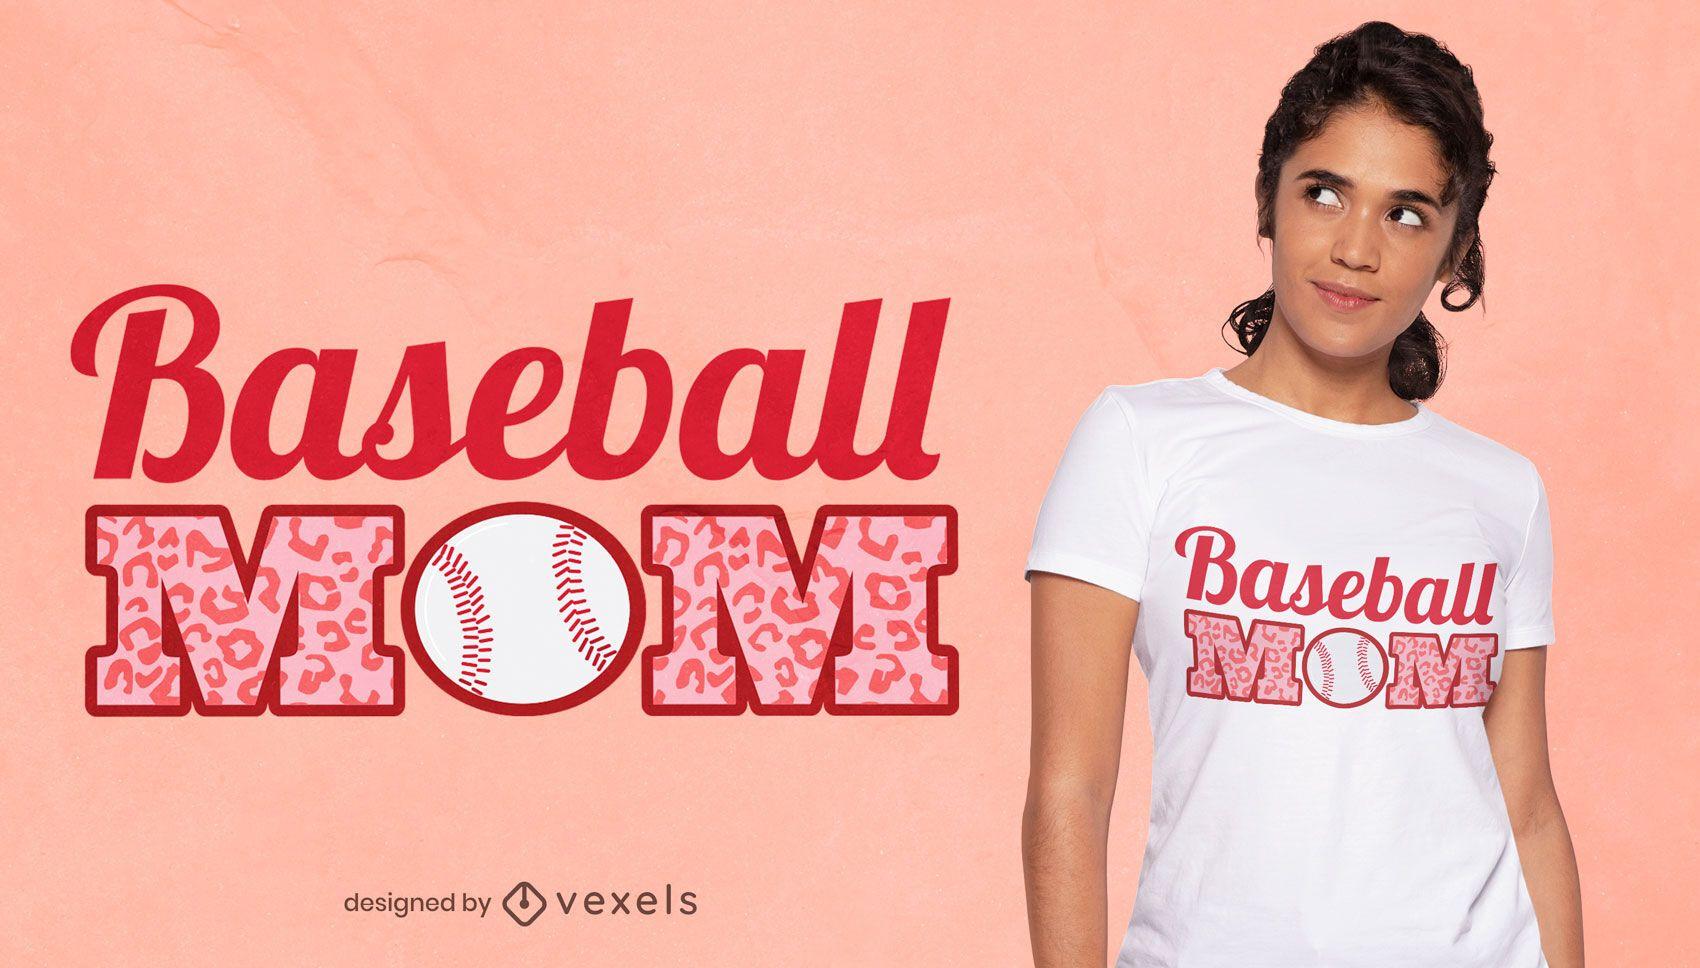 Diseño de camiseta divertida con cita de mamá de béisbol